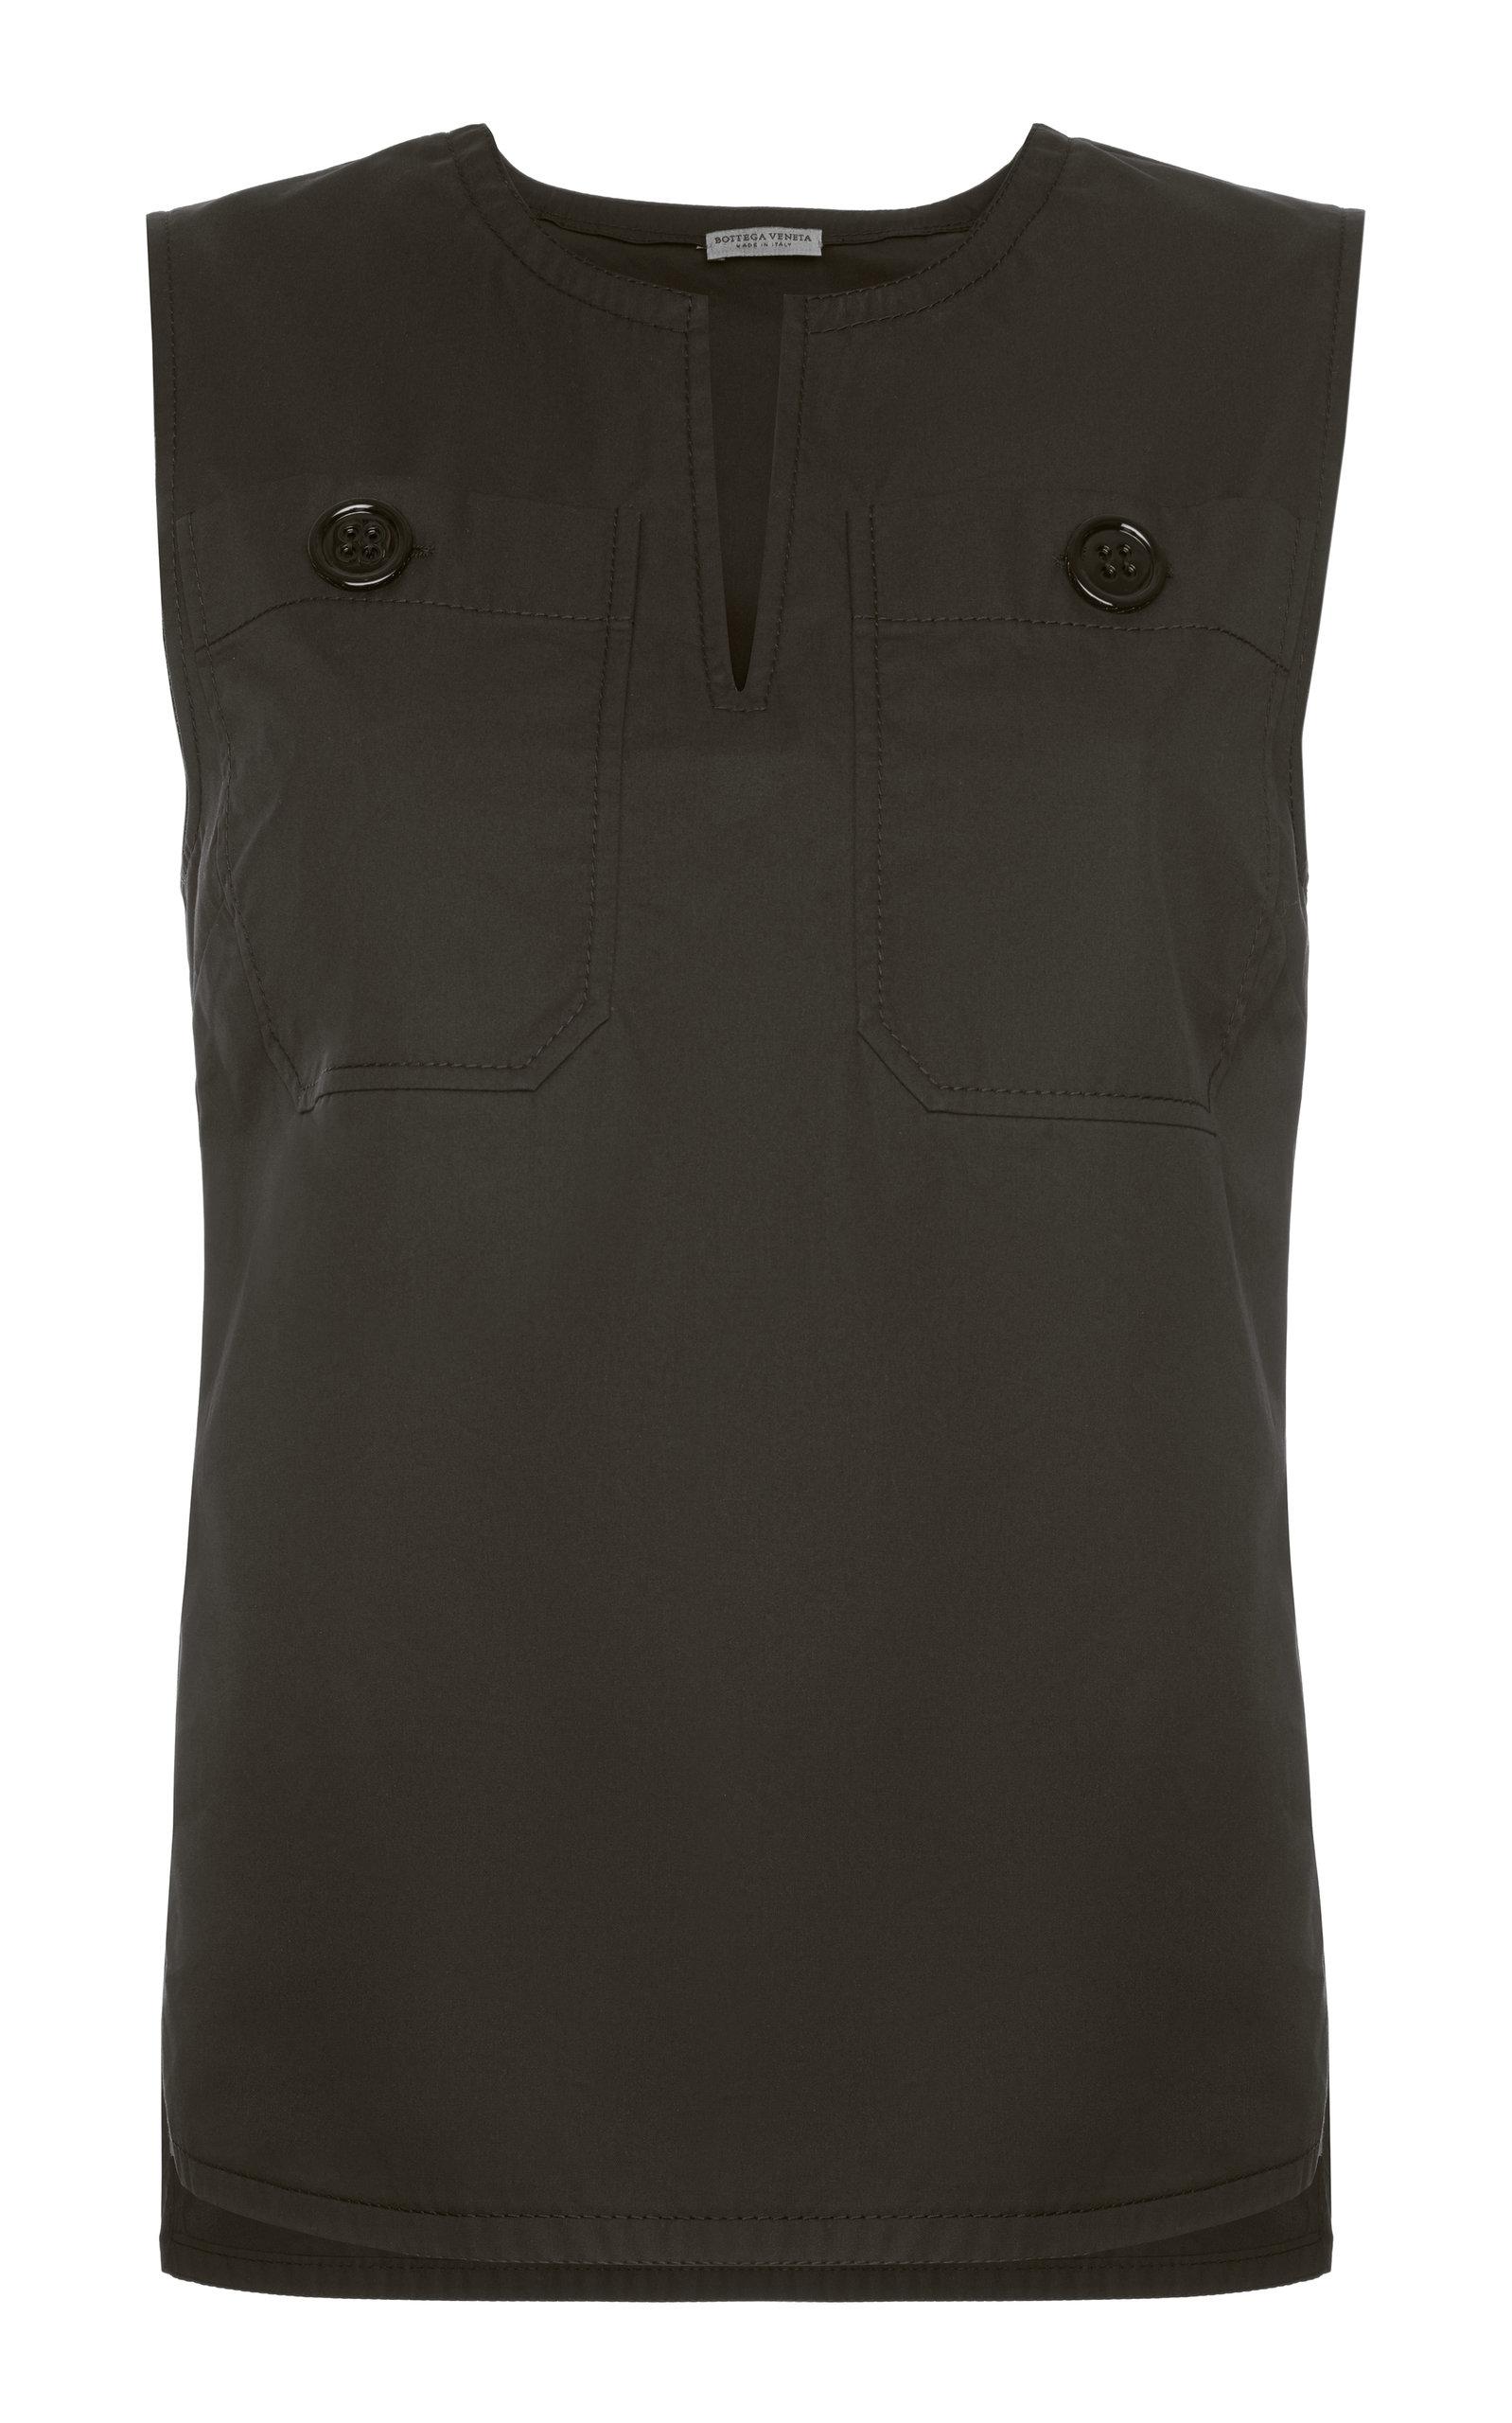 New Arrival Cheap Online Sale Big Discount tie front sleeveless blouse - Black Bottega Veneta Affordable SldGdHn